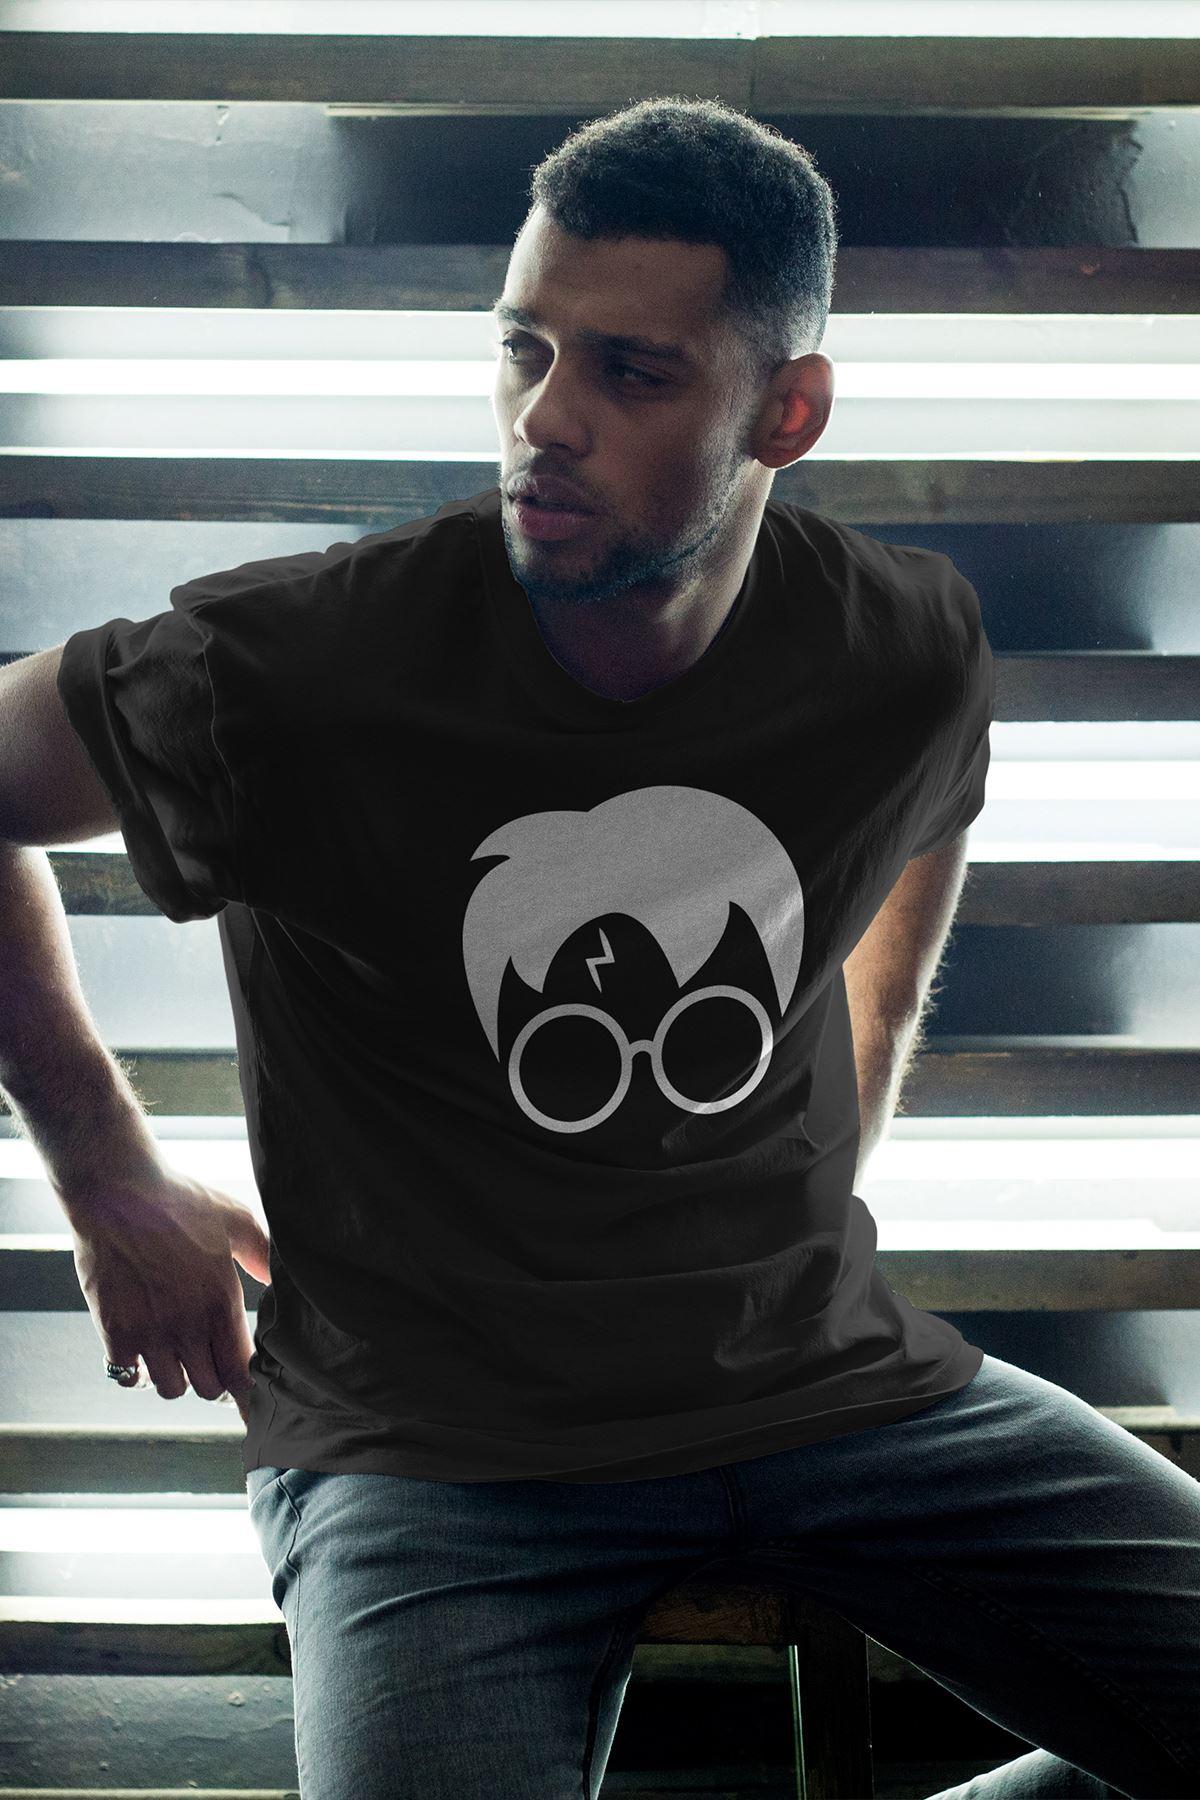 Harry Potter 02 Siyah Erkek Oversize Tshirt - Tişört